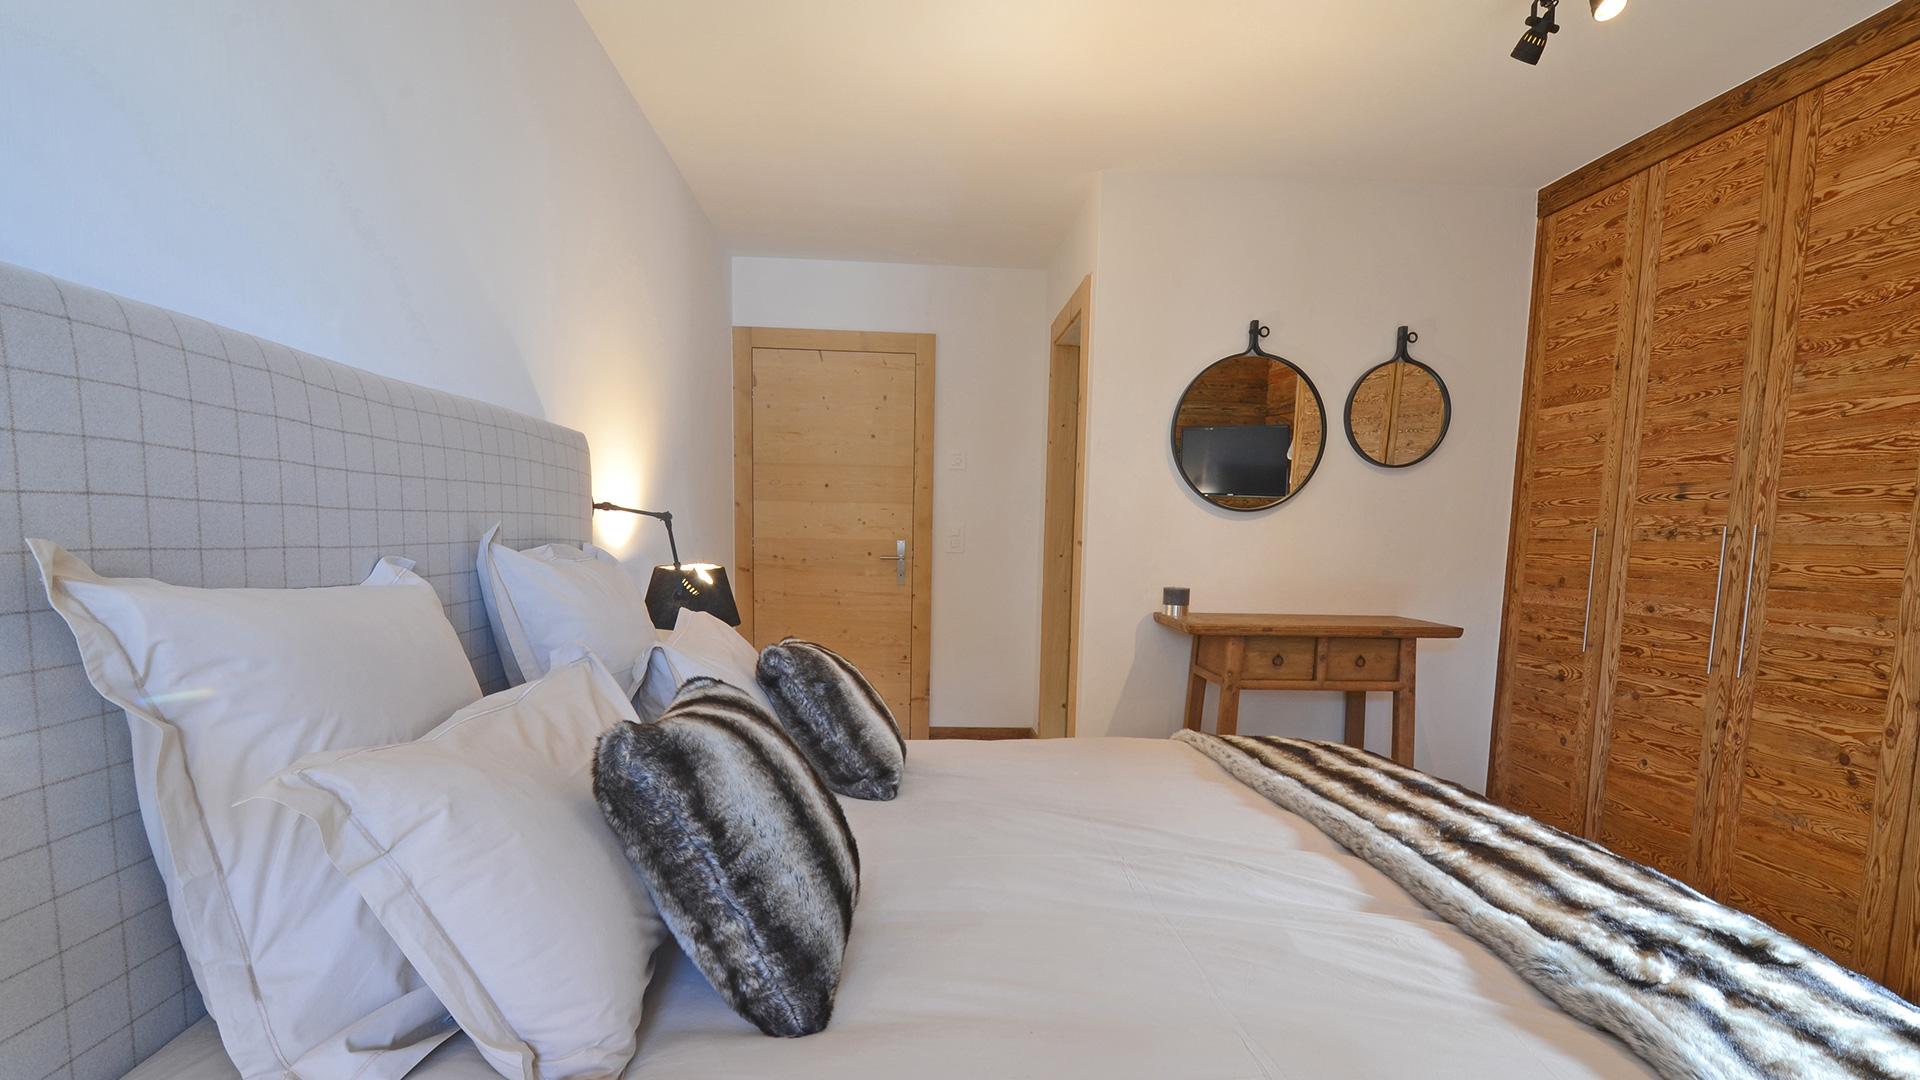 Residence du Parc Apartments, Switzerland